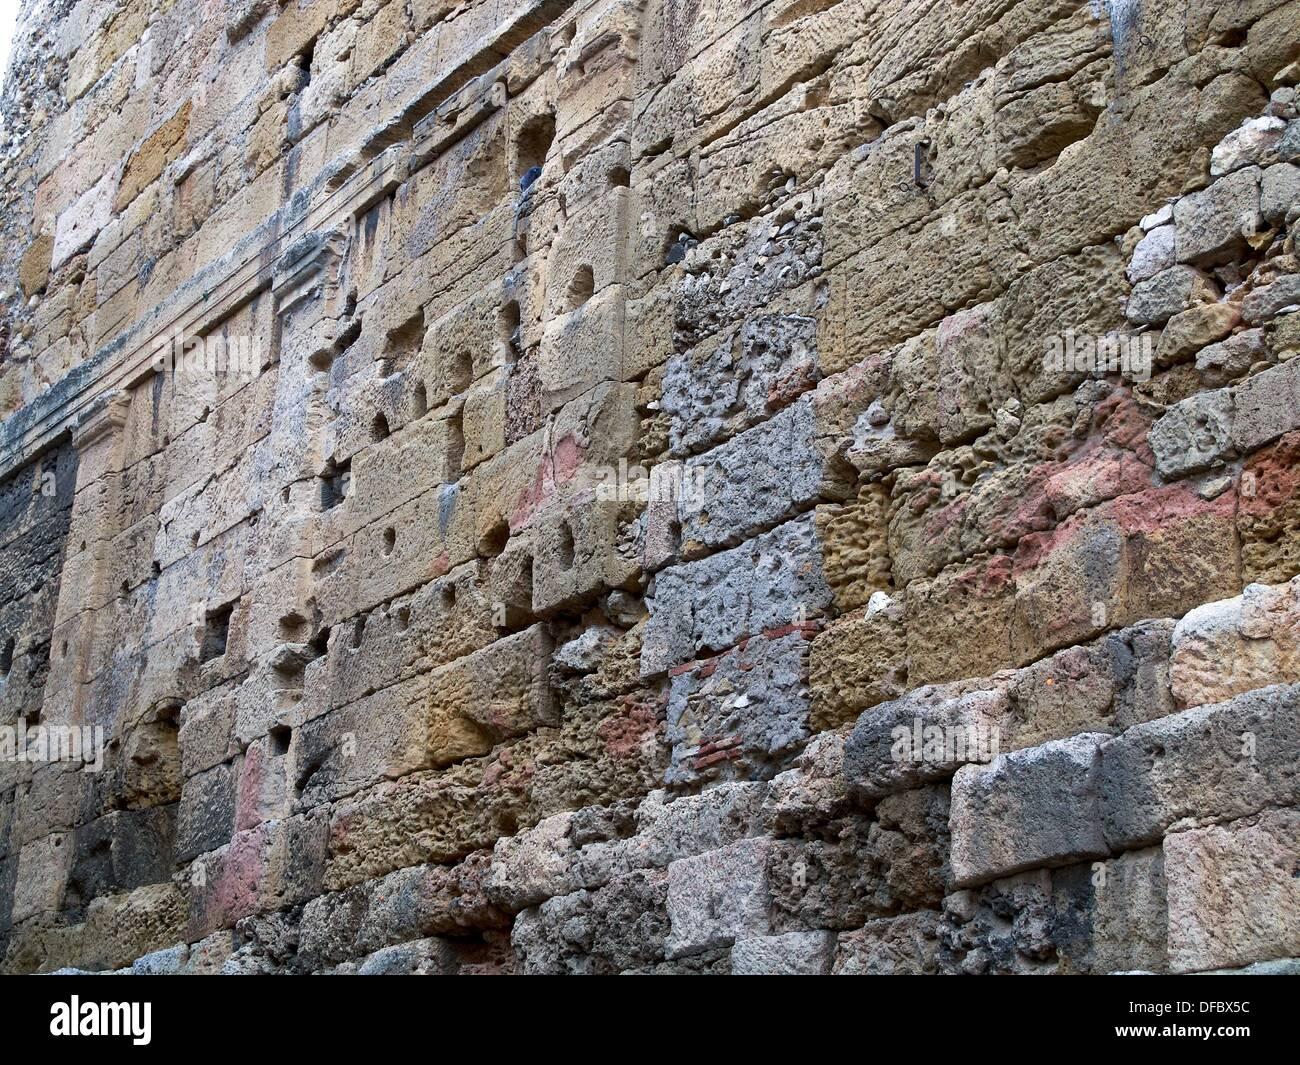 -Ancient Walls of Tarraco- Catalonian, Spain. - Stock Image